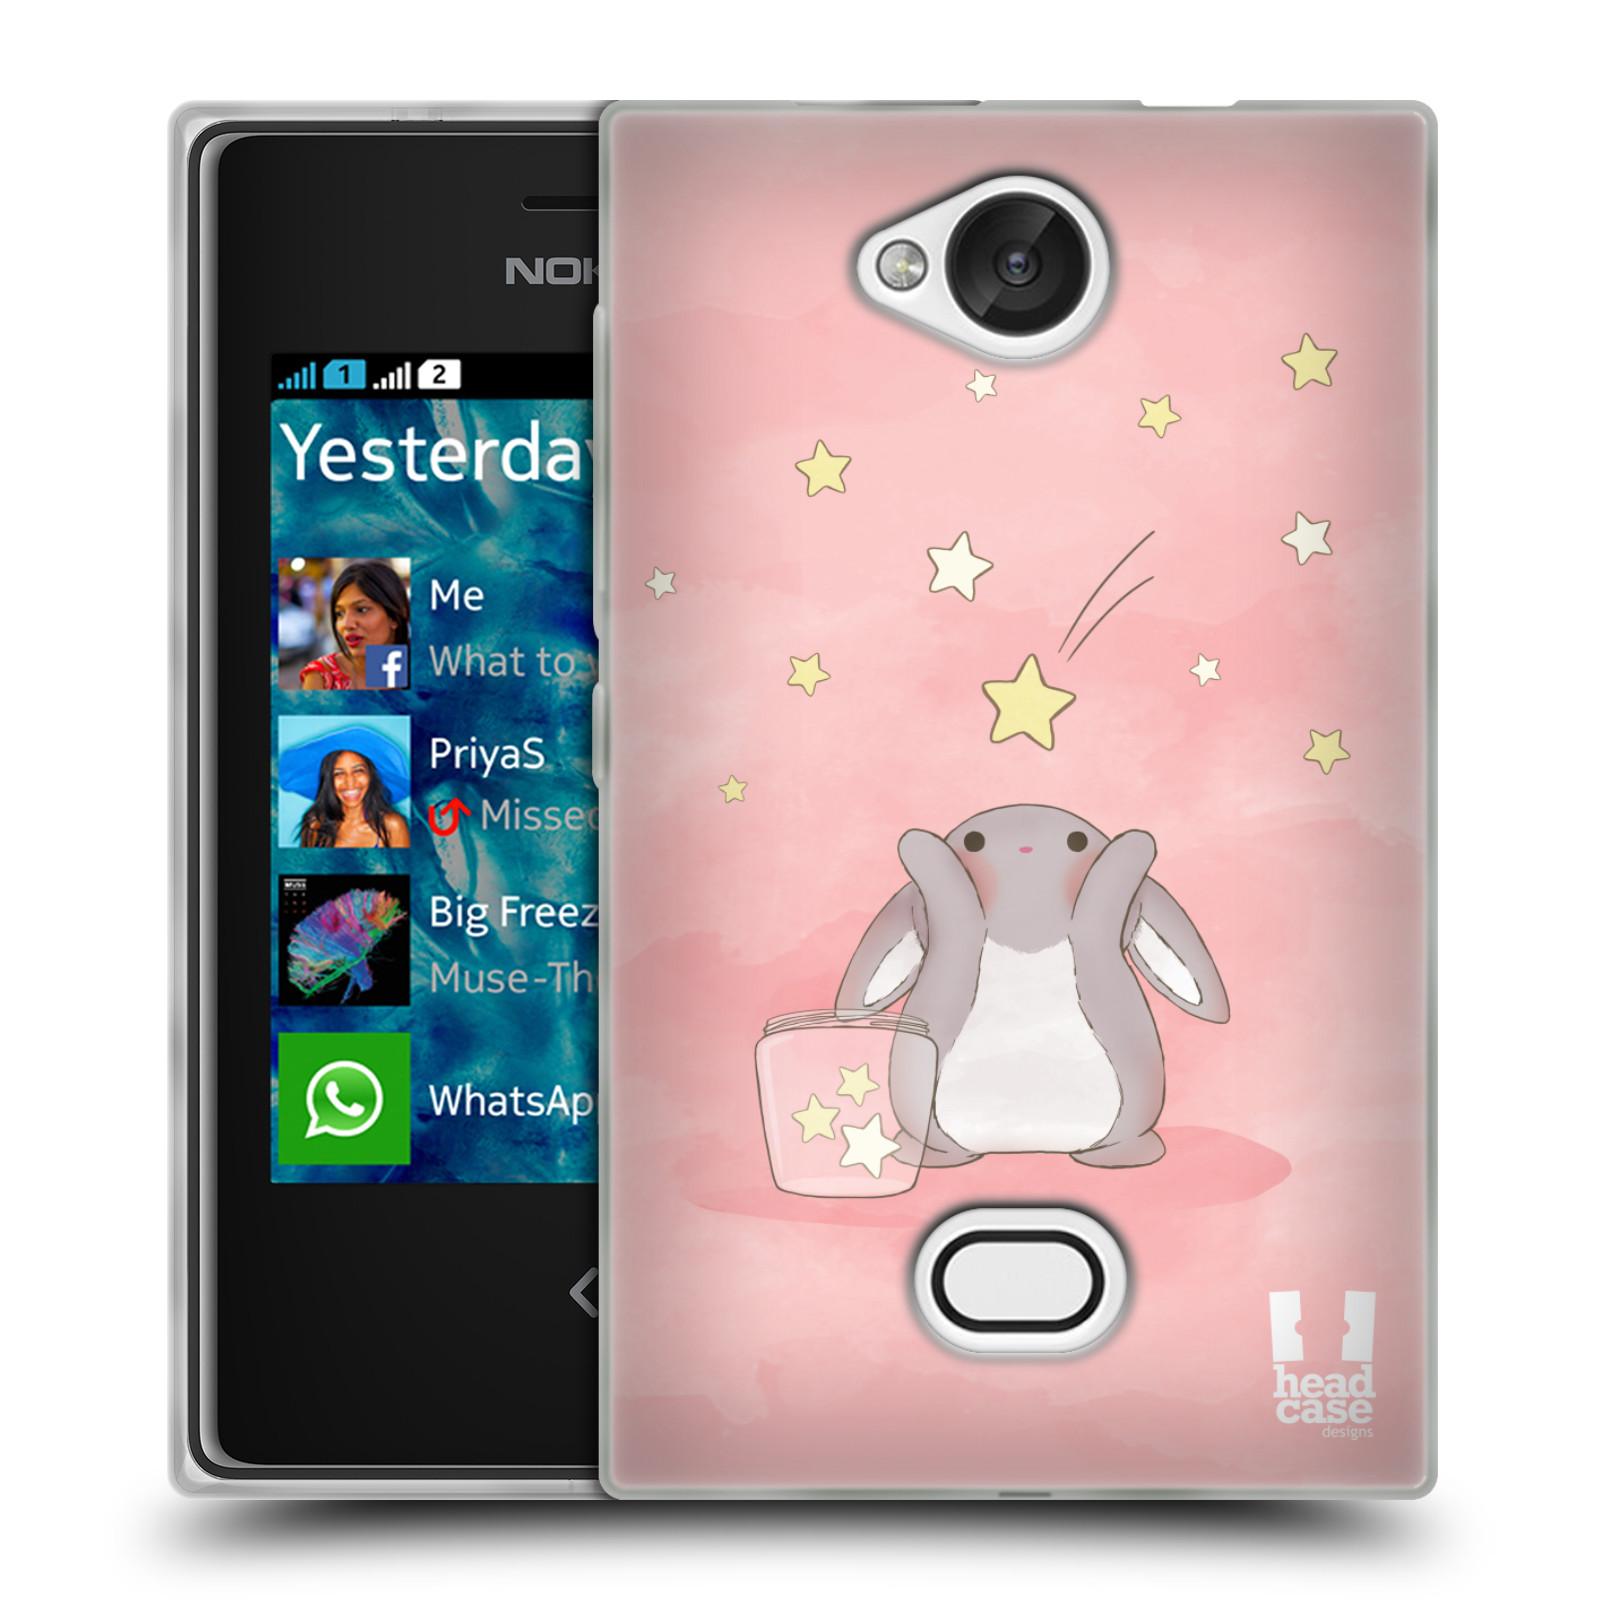 HEAD CASE silikonový obal na mobil NOKIA Asha 503 vzor králíček a hvězdy růžová